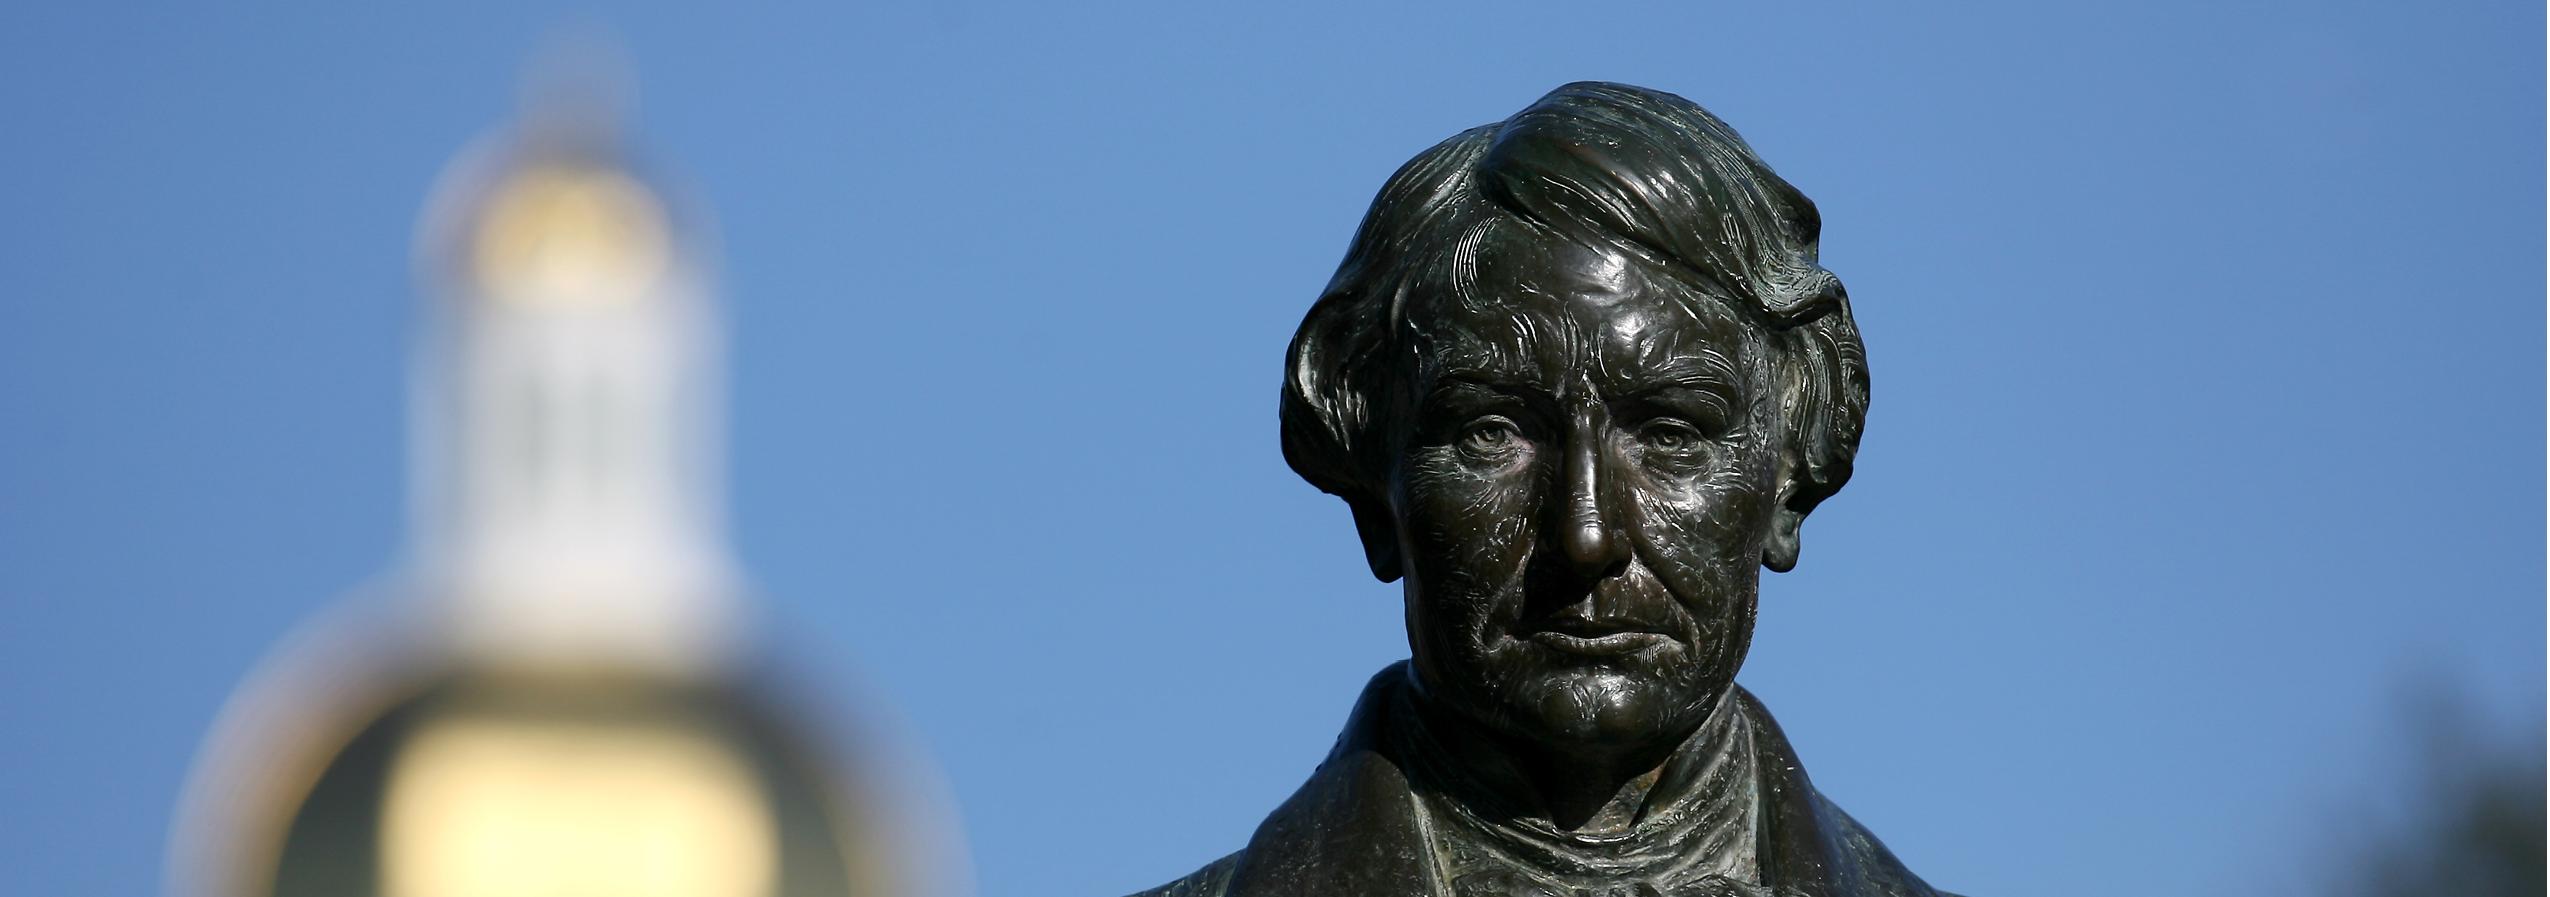 Closeup photo of Judge Baylor Statue